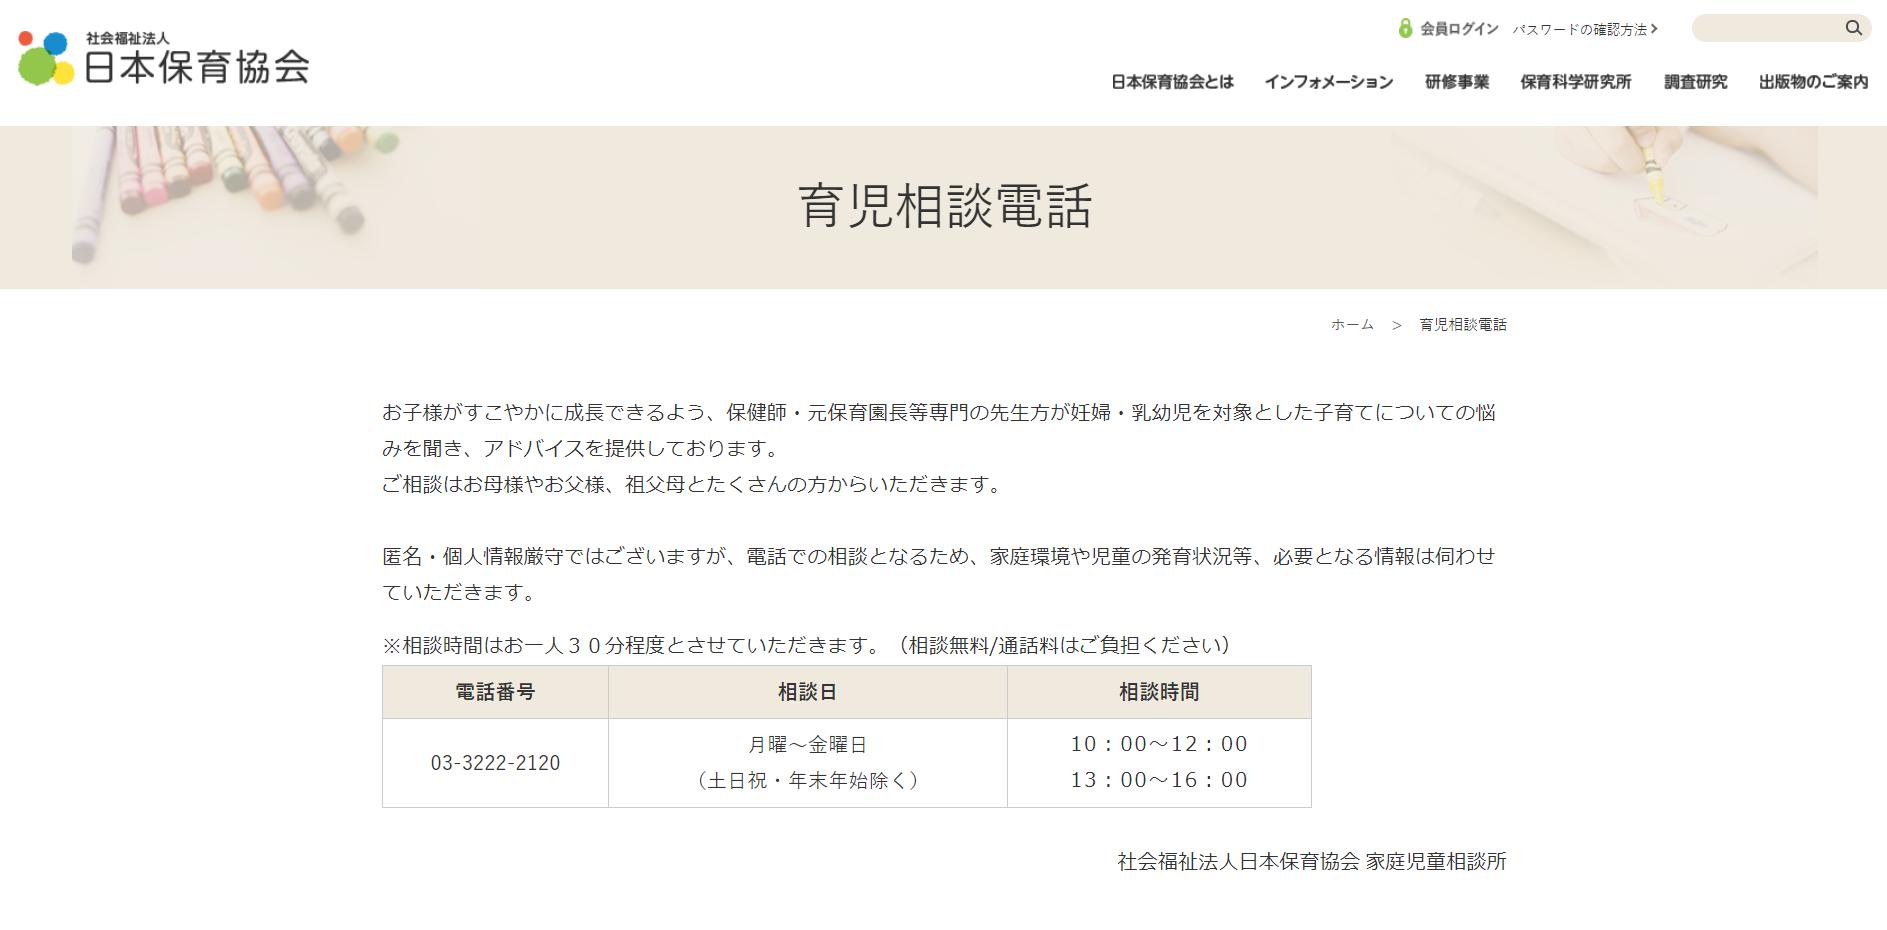 japan-childcare-organization